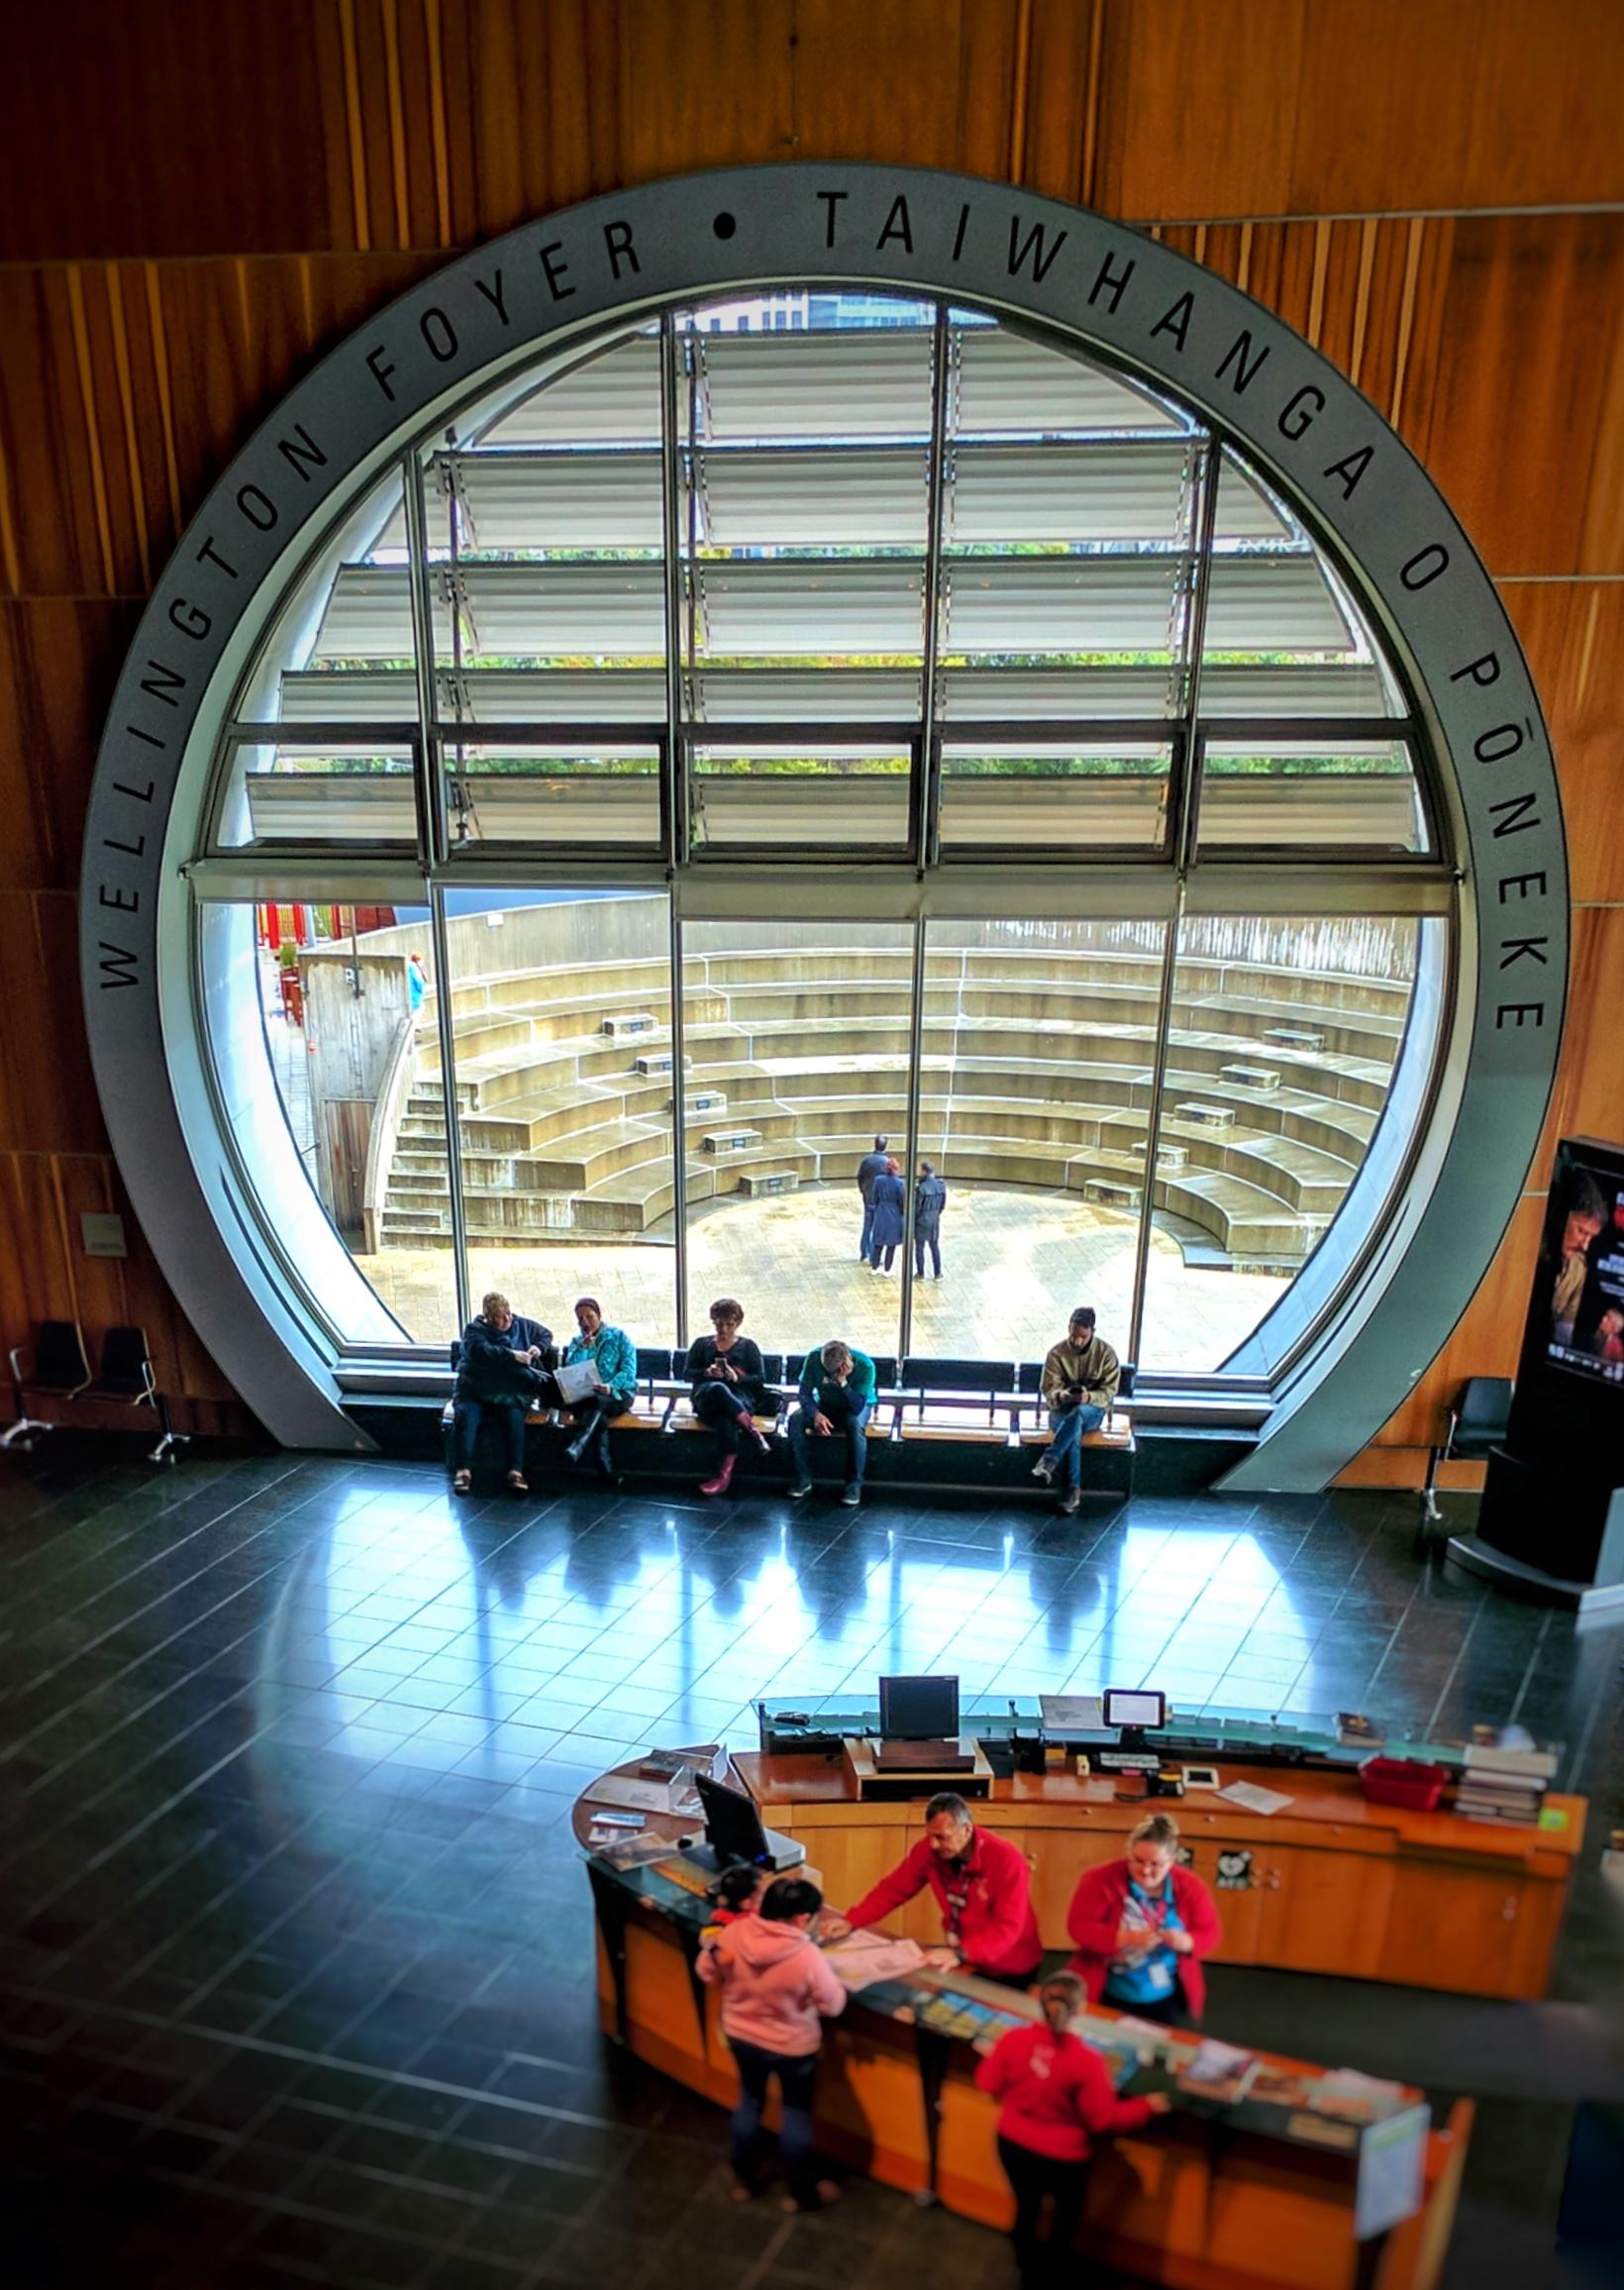 Wellington Foyer window at Te Papa Museum (Aotearoa New Zealand)